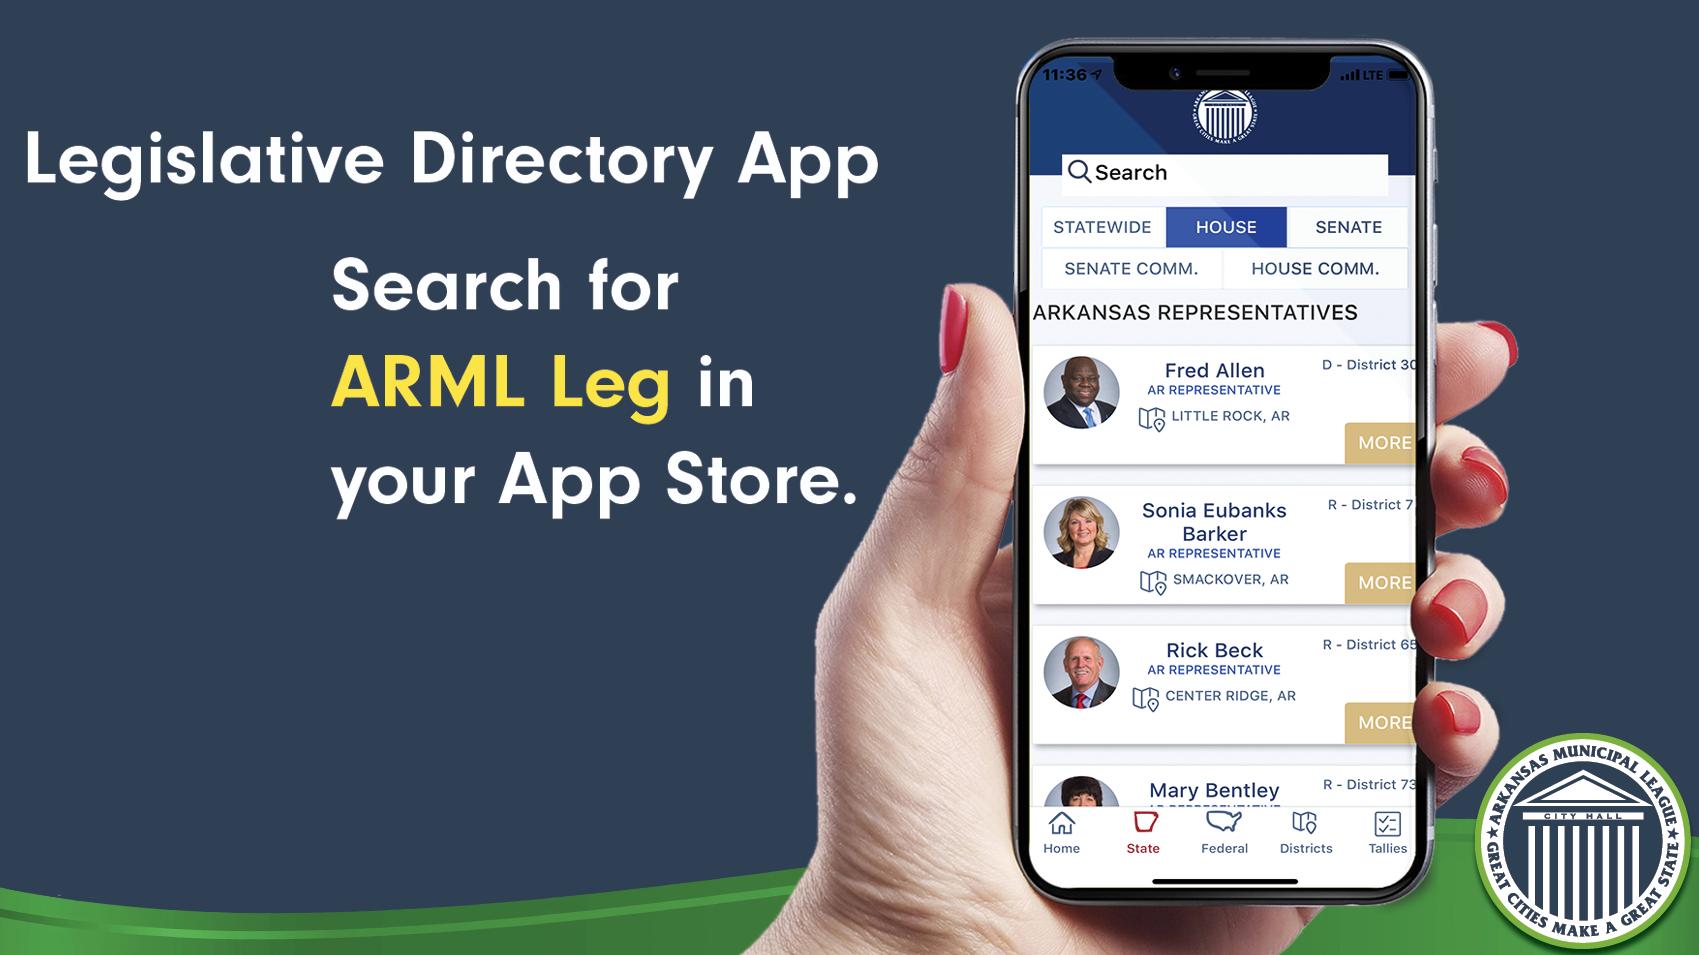 Legislative Directory App - Search for ARML Leg in your App Store